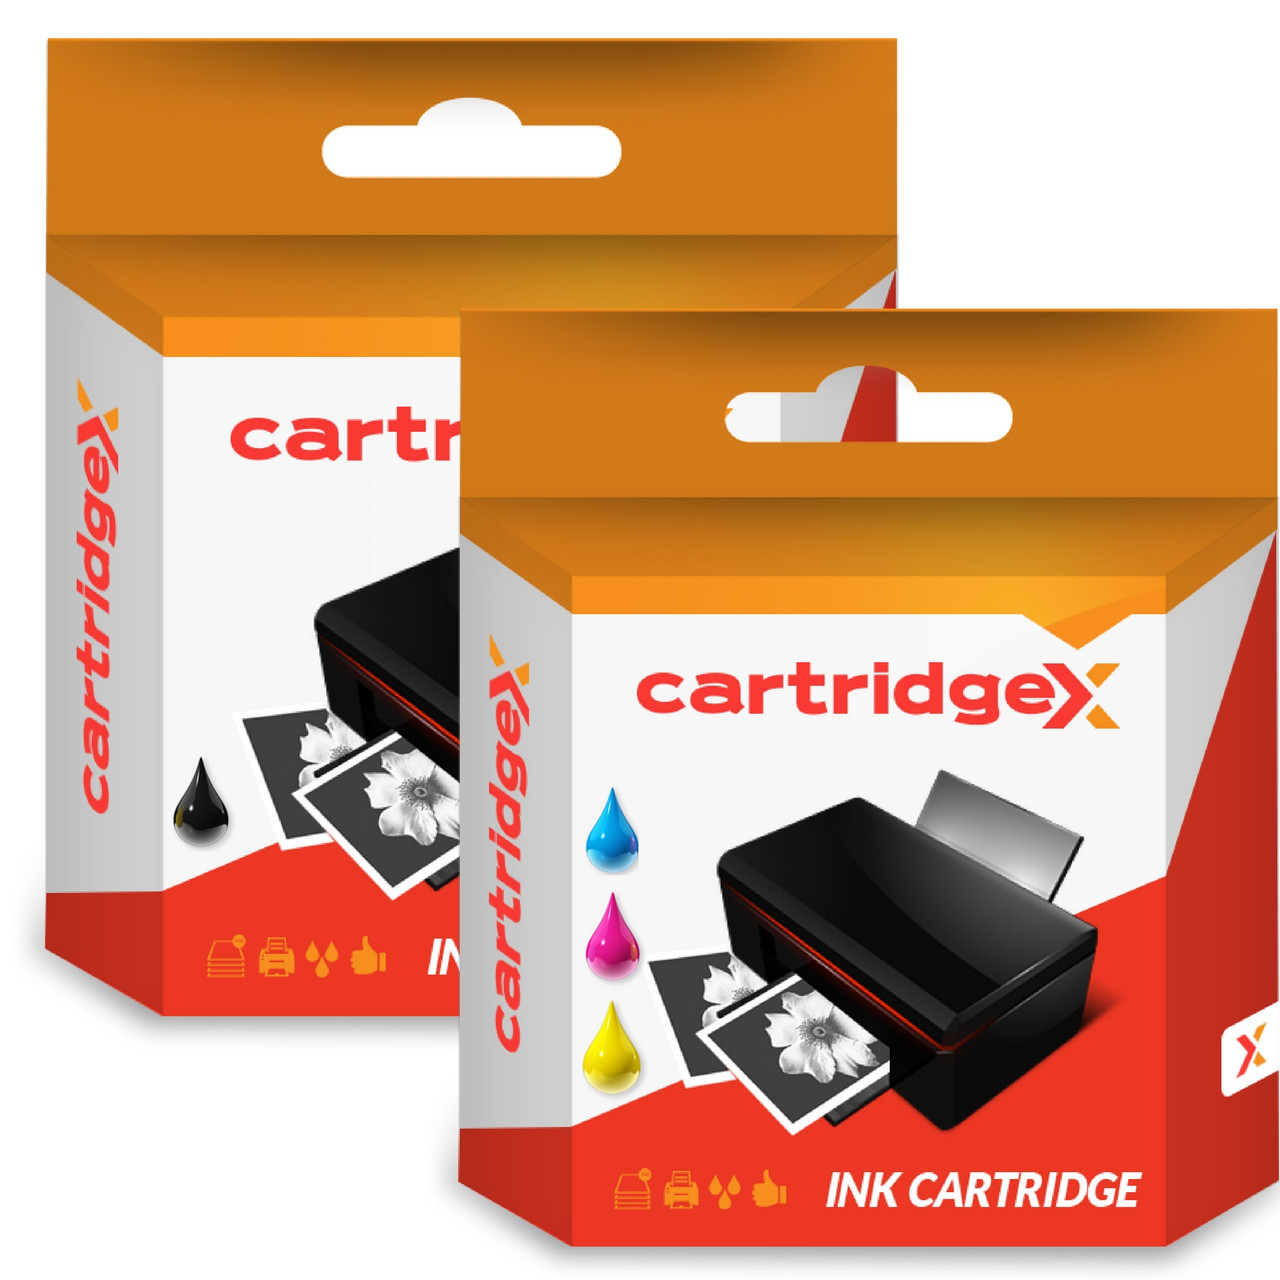 Compatible High Capacity Hp 337 Black & Hp 343 Tri-colour Ink Cartridge Multipack (Hp C9364ee & C8766ee)